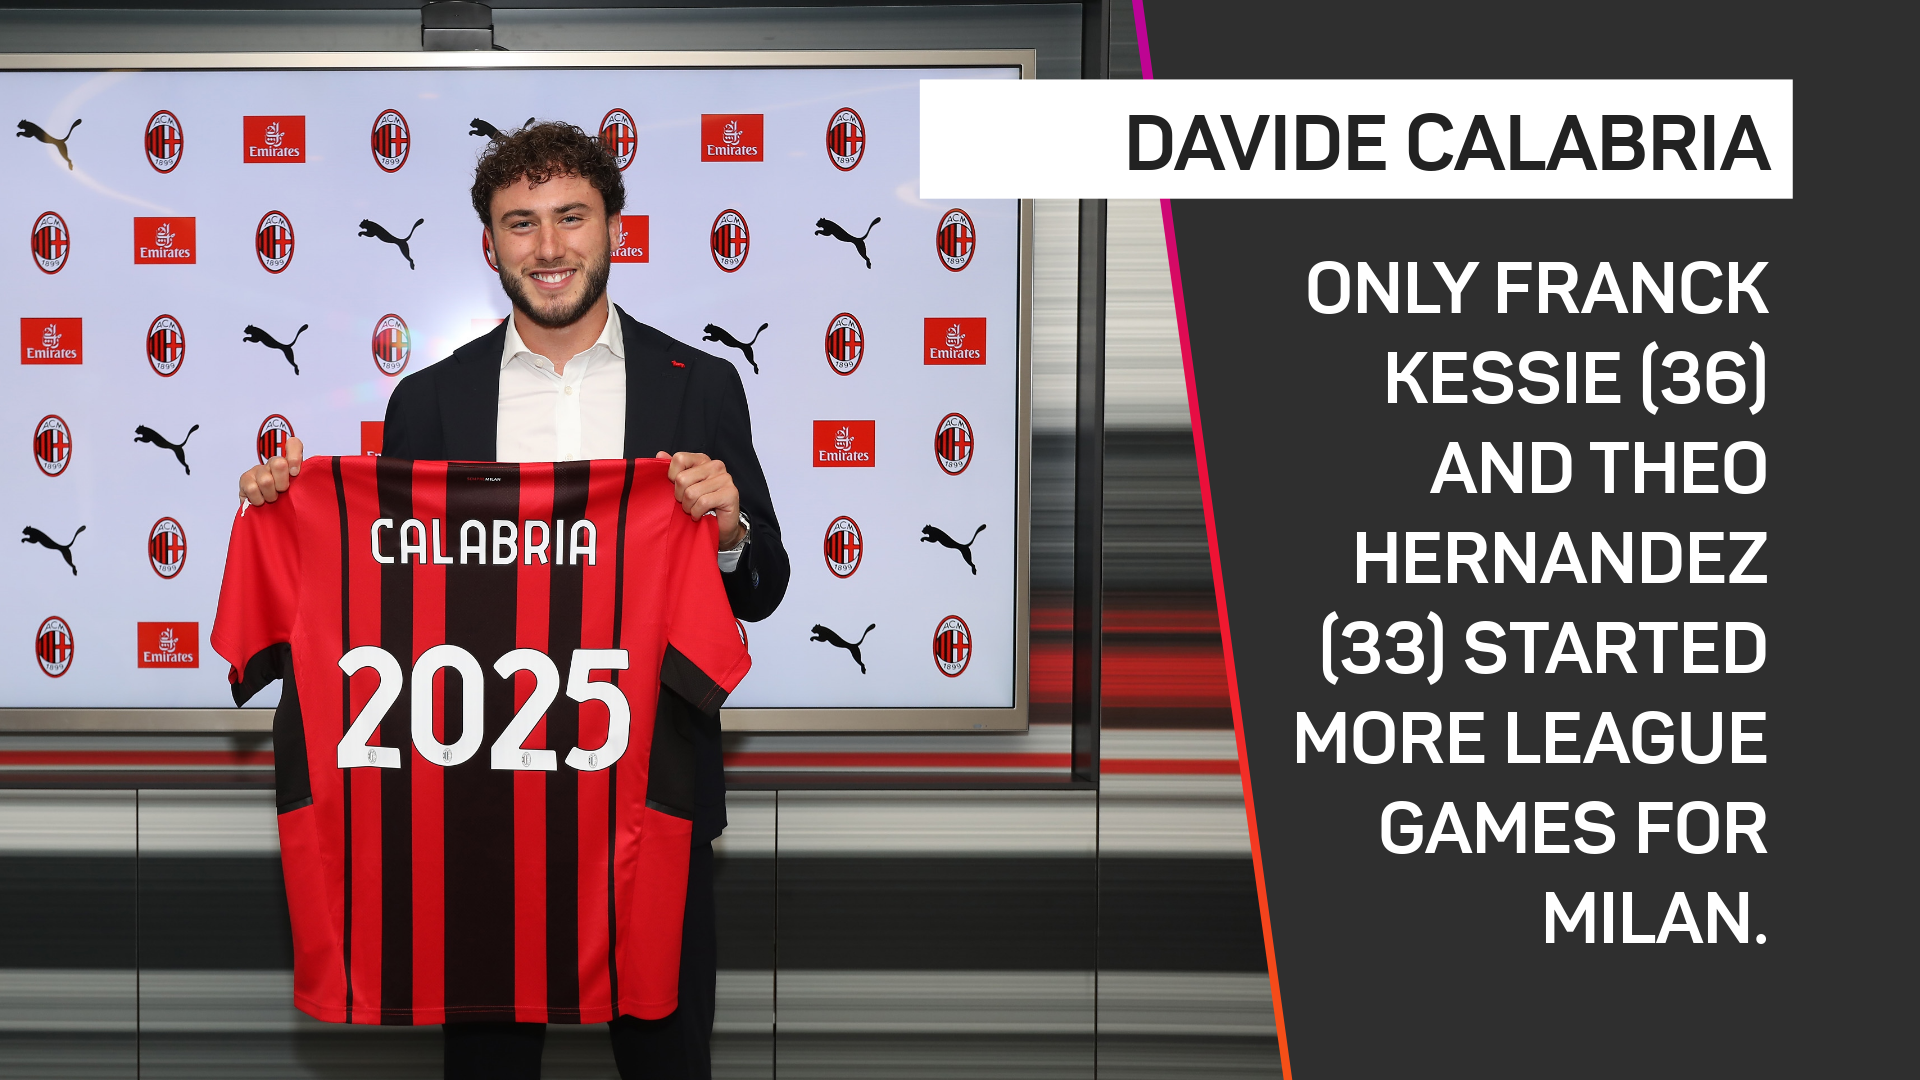 Davide Calabria appearances